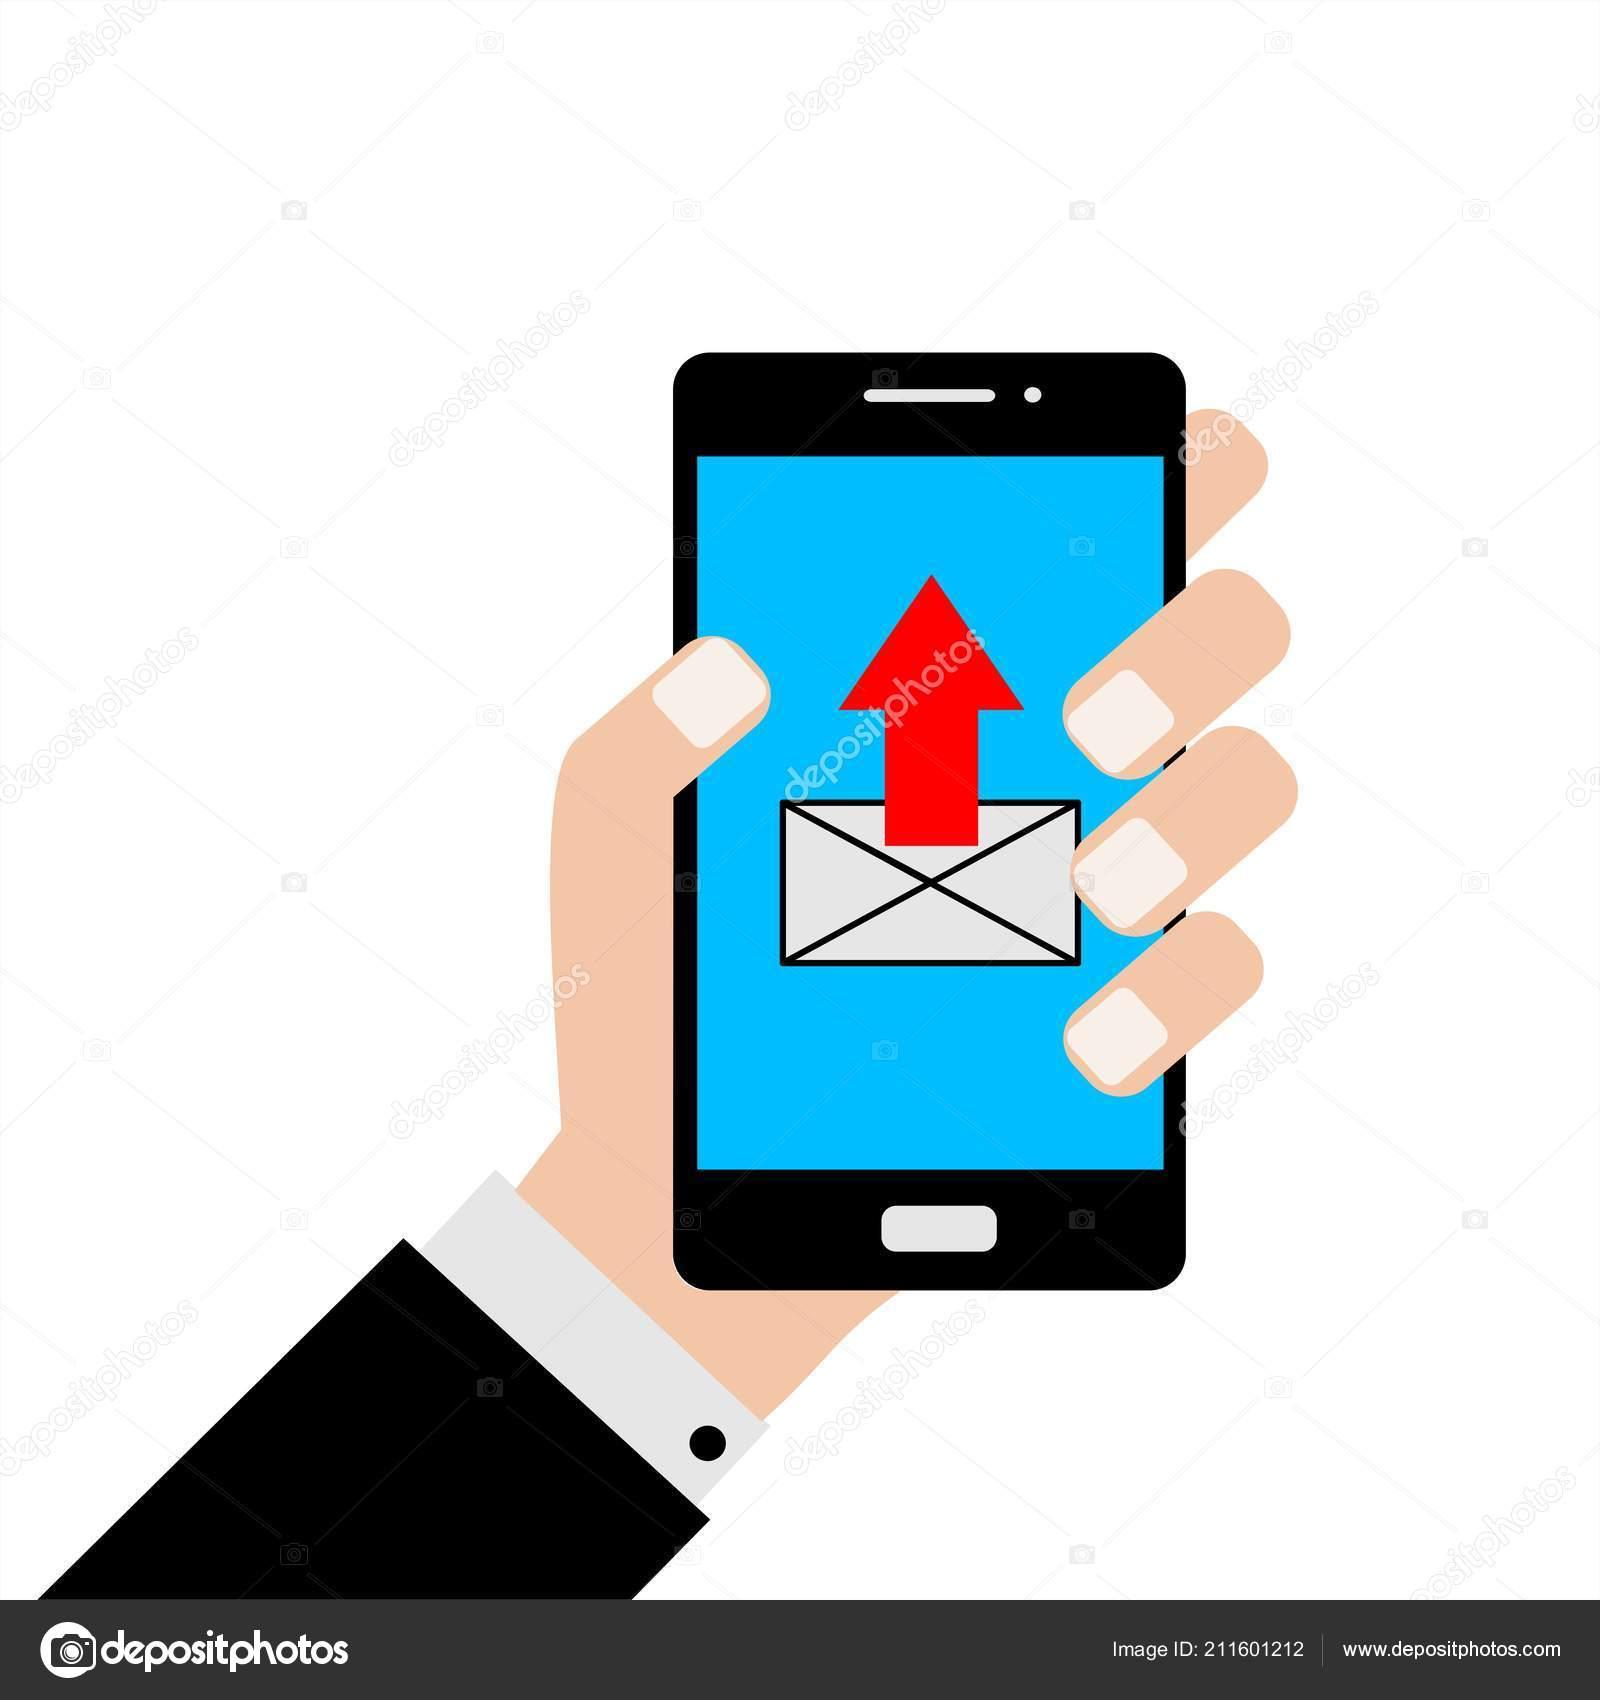 fd2741cc7dc Επιχειρηματίας Που Κατέχουν Ένα Smartphone Μια Αποστολή Μηνύματος ...